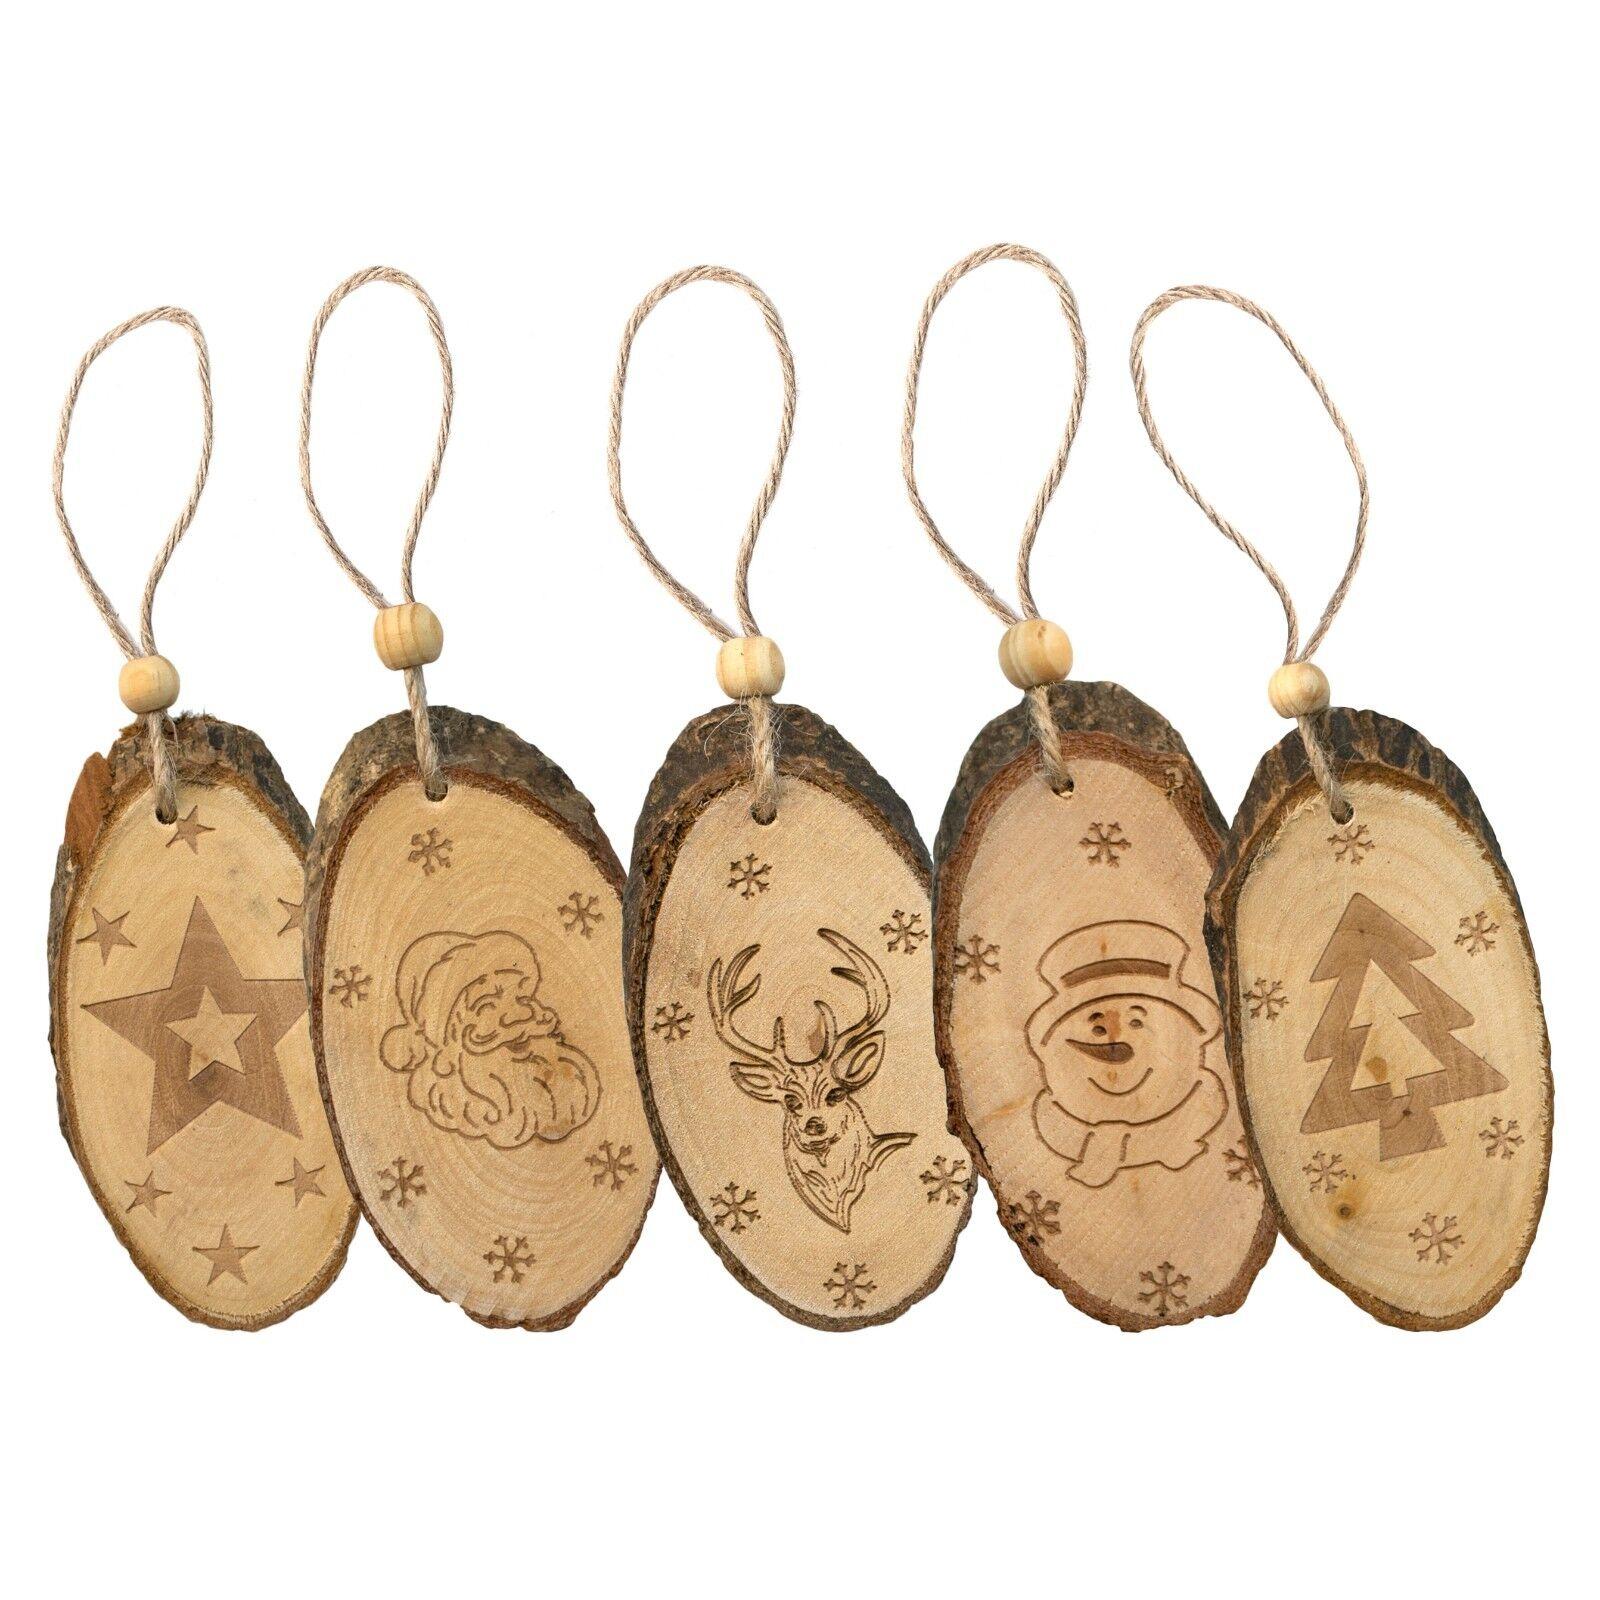 Wooden Wood Log Slice Tree Cutting Christmas Tree Pendants Ornaments Decorations